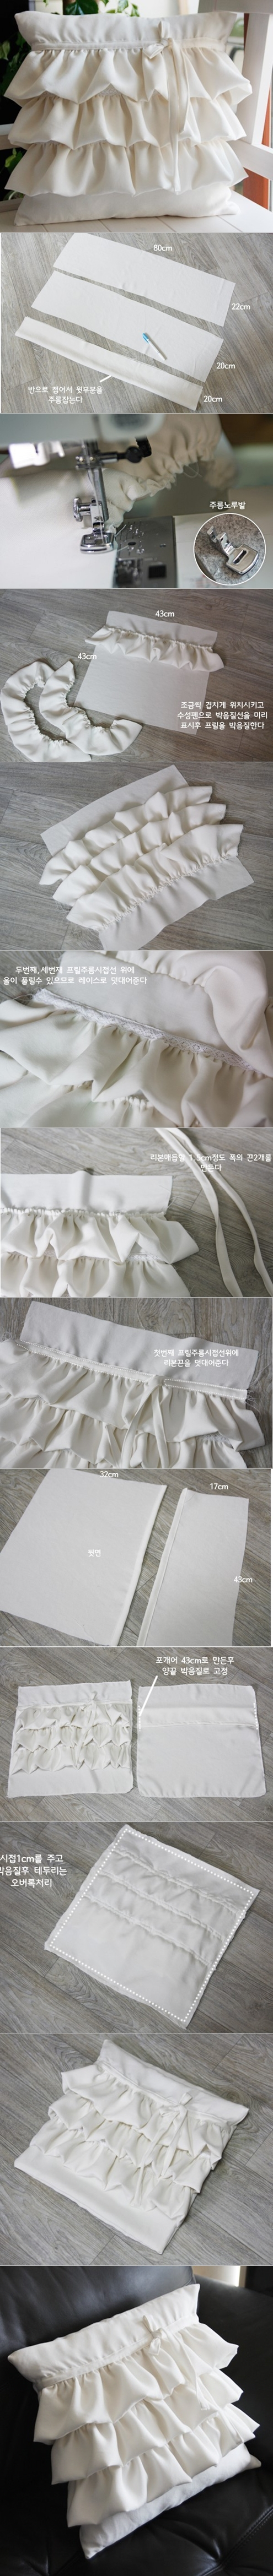 ruffle pillow case tutorial